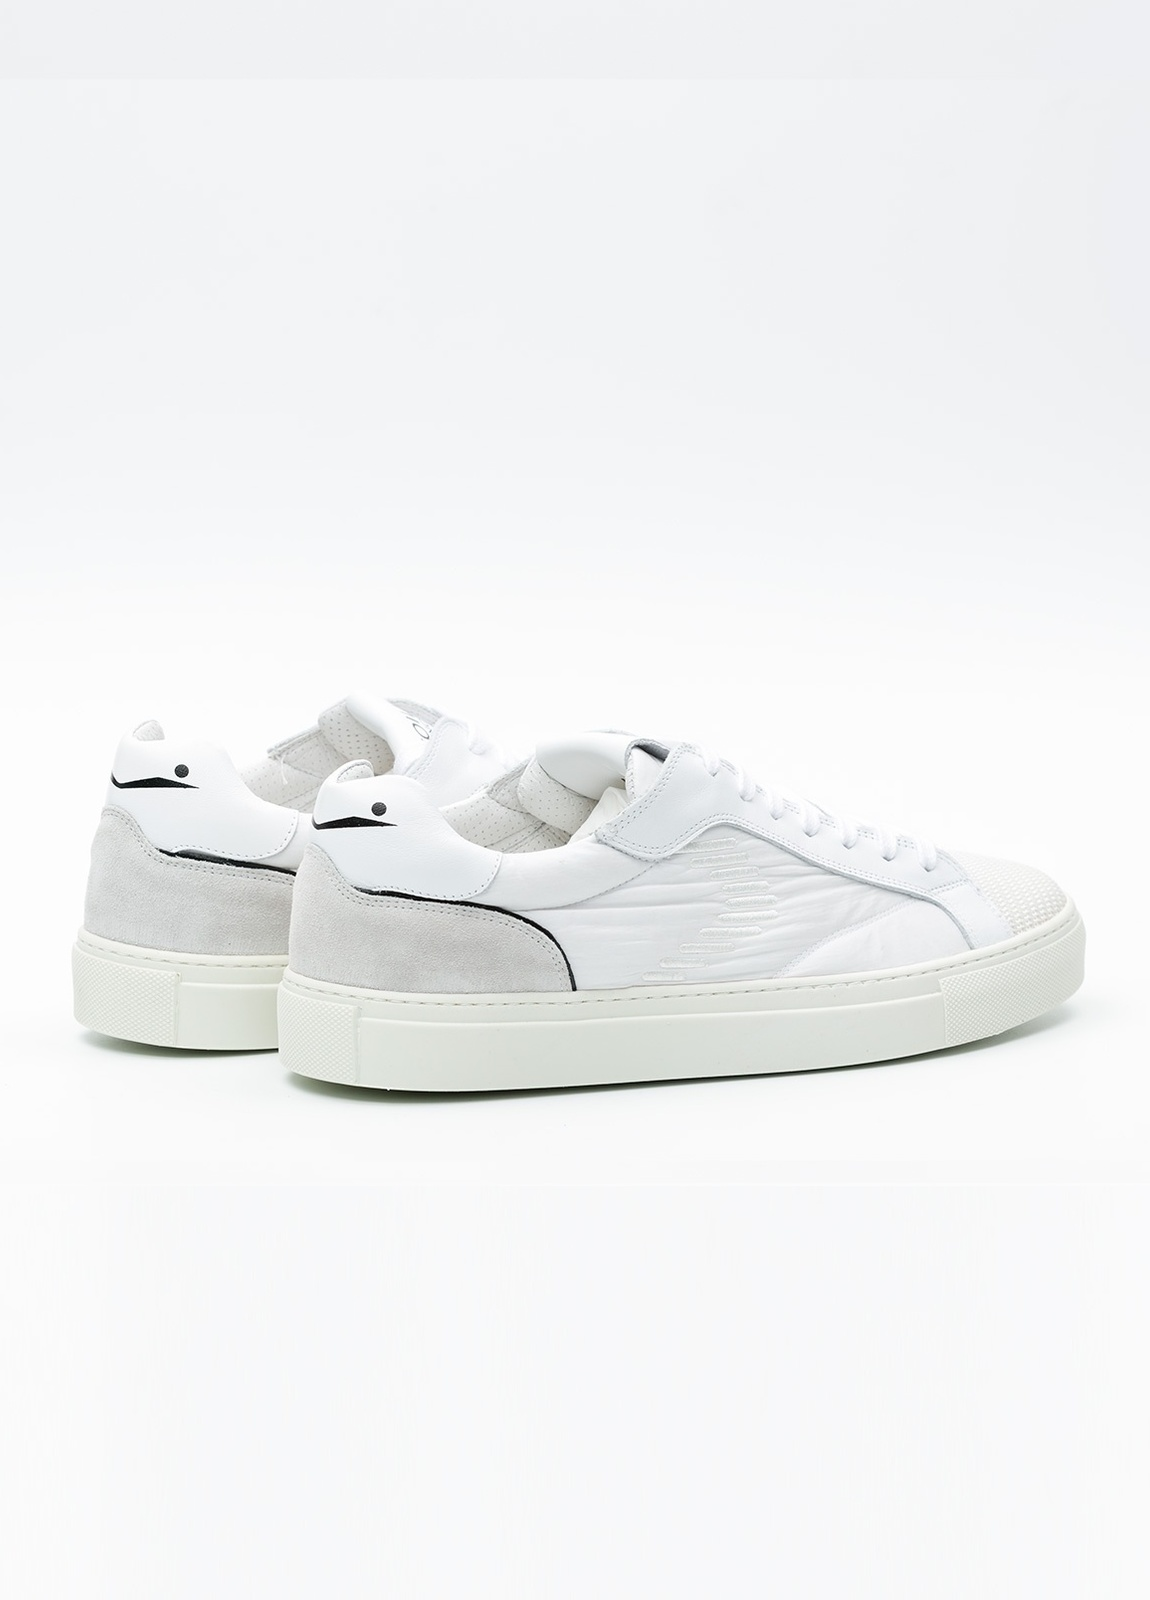 Bambas moda hombre modelo PORTOFINO color blanco, Serraje y tejido técnico. - Ítem1